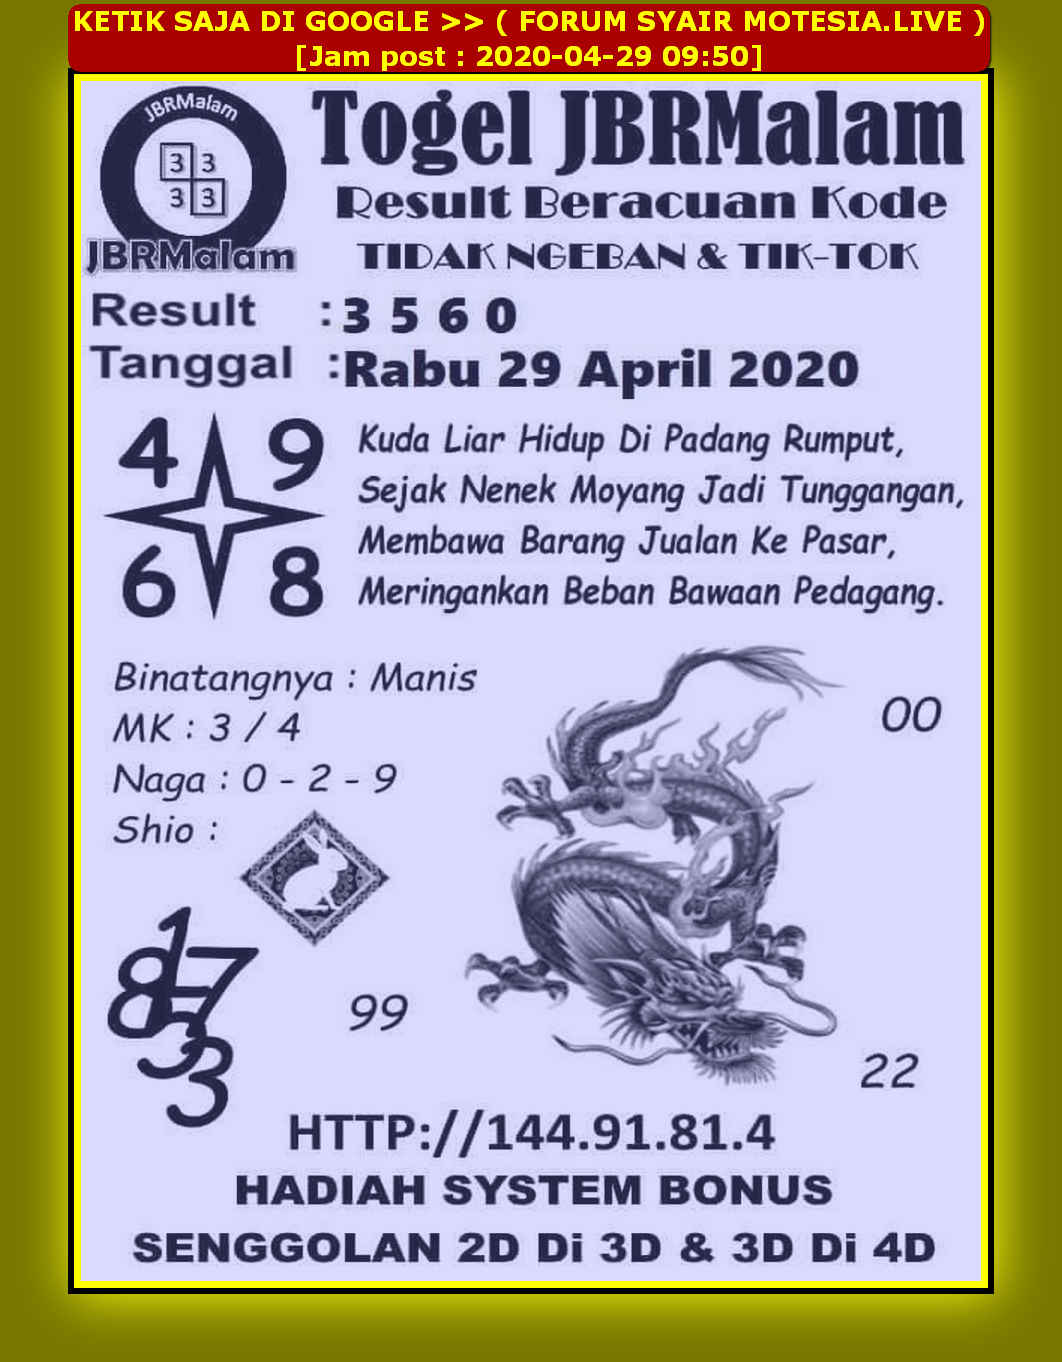 Kode syair Sydney Rabu 29 April 2020 97